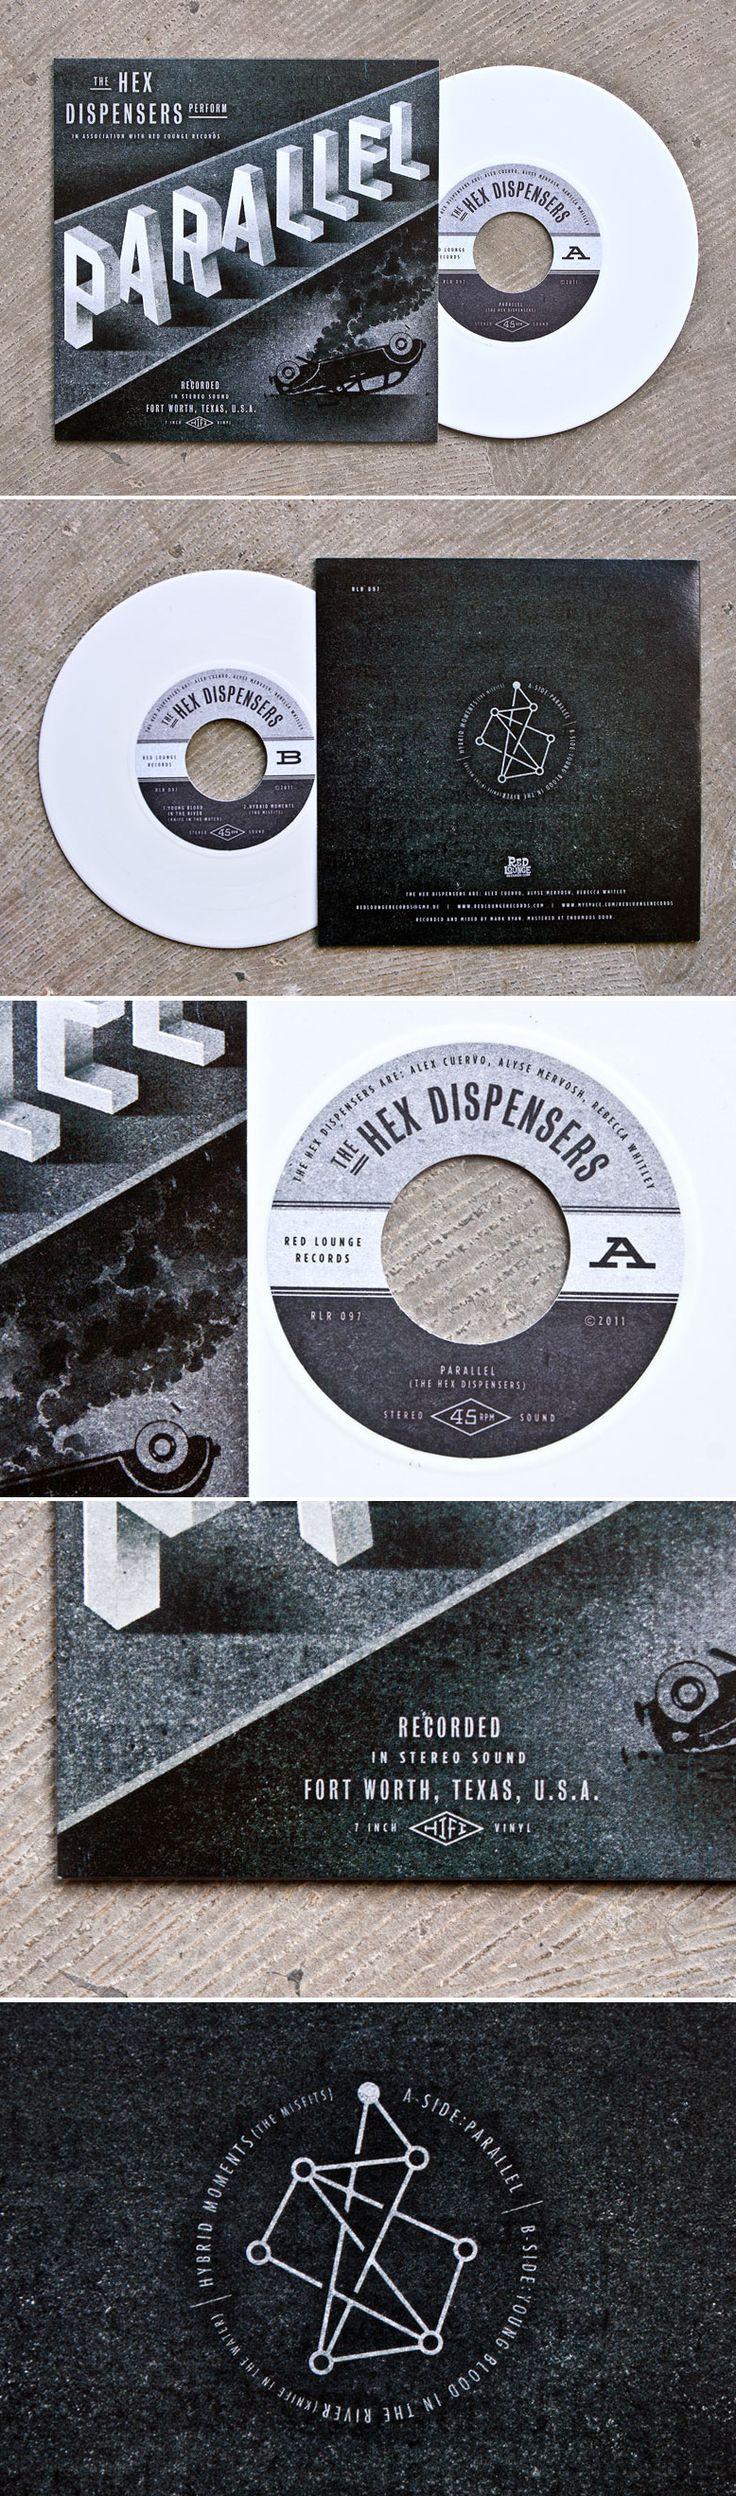 Parallel CD by Karl Hebert